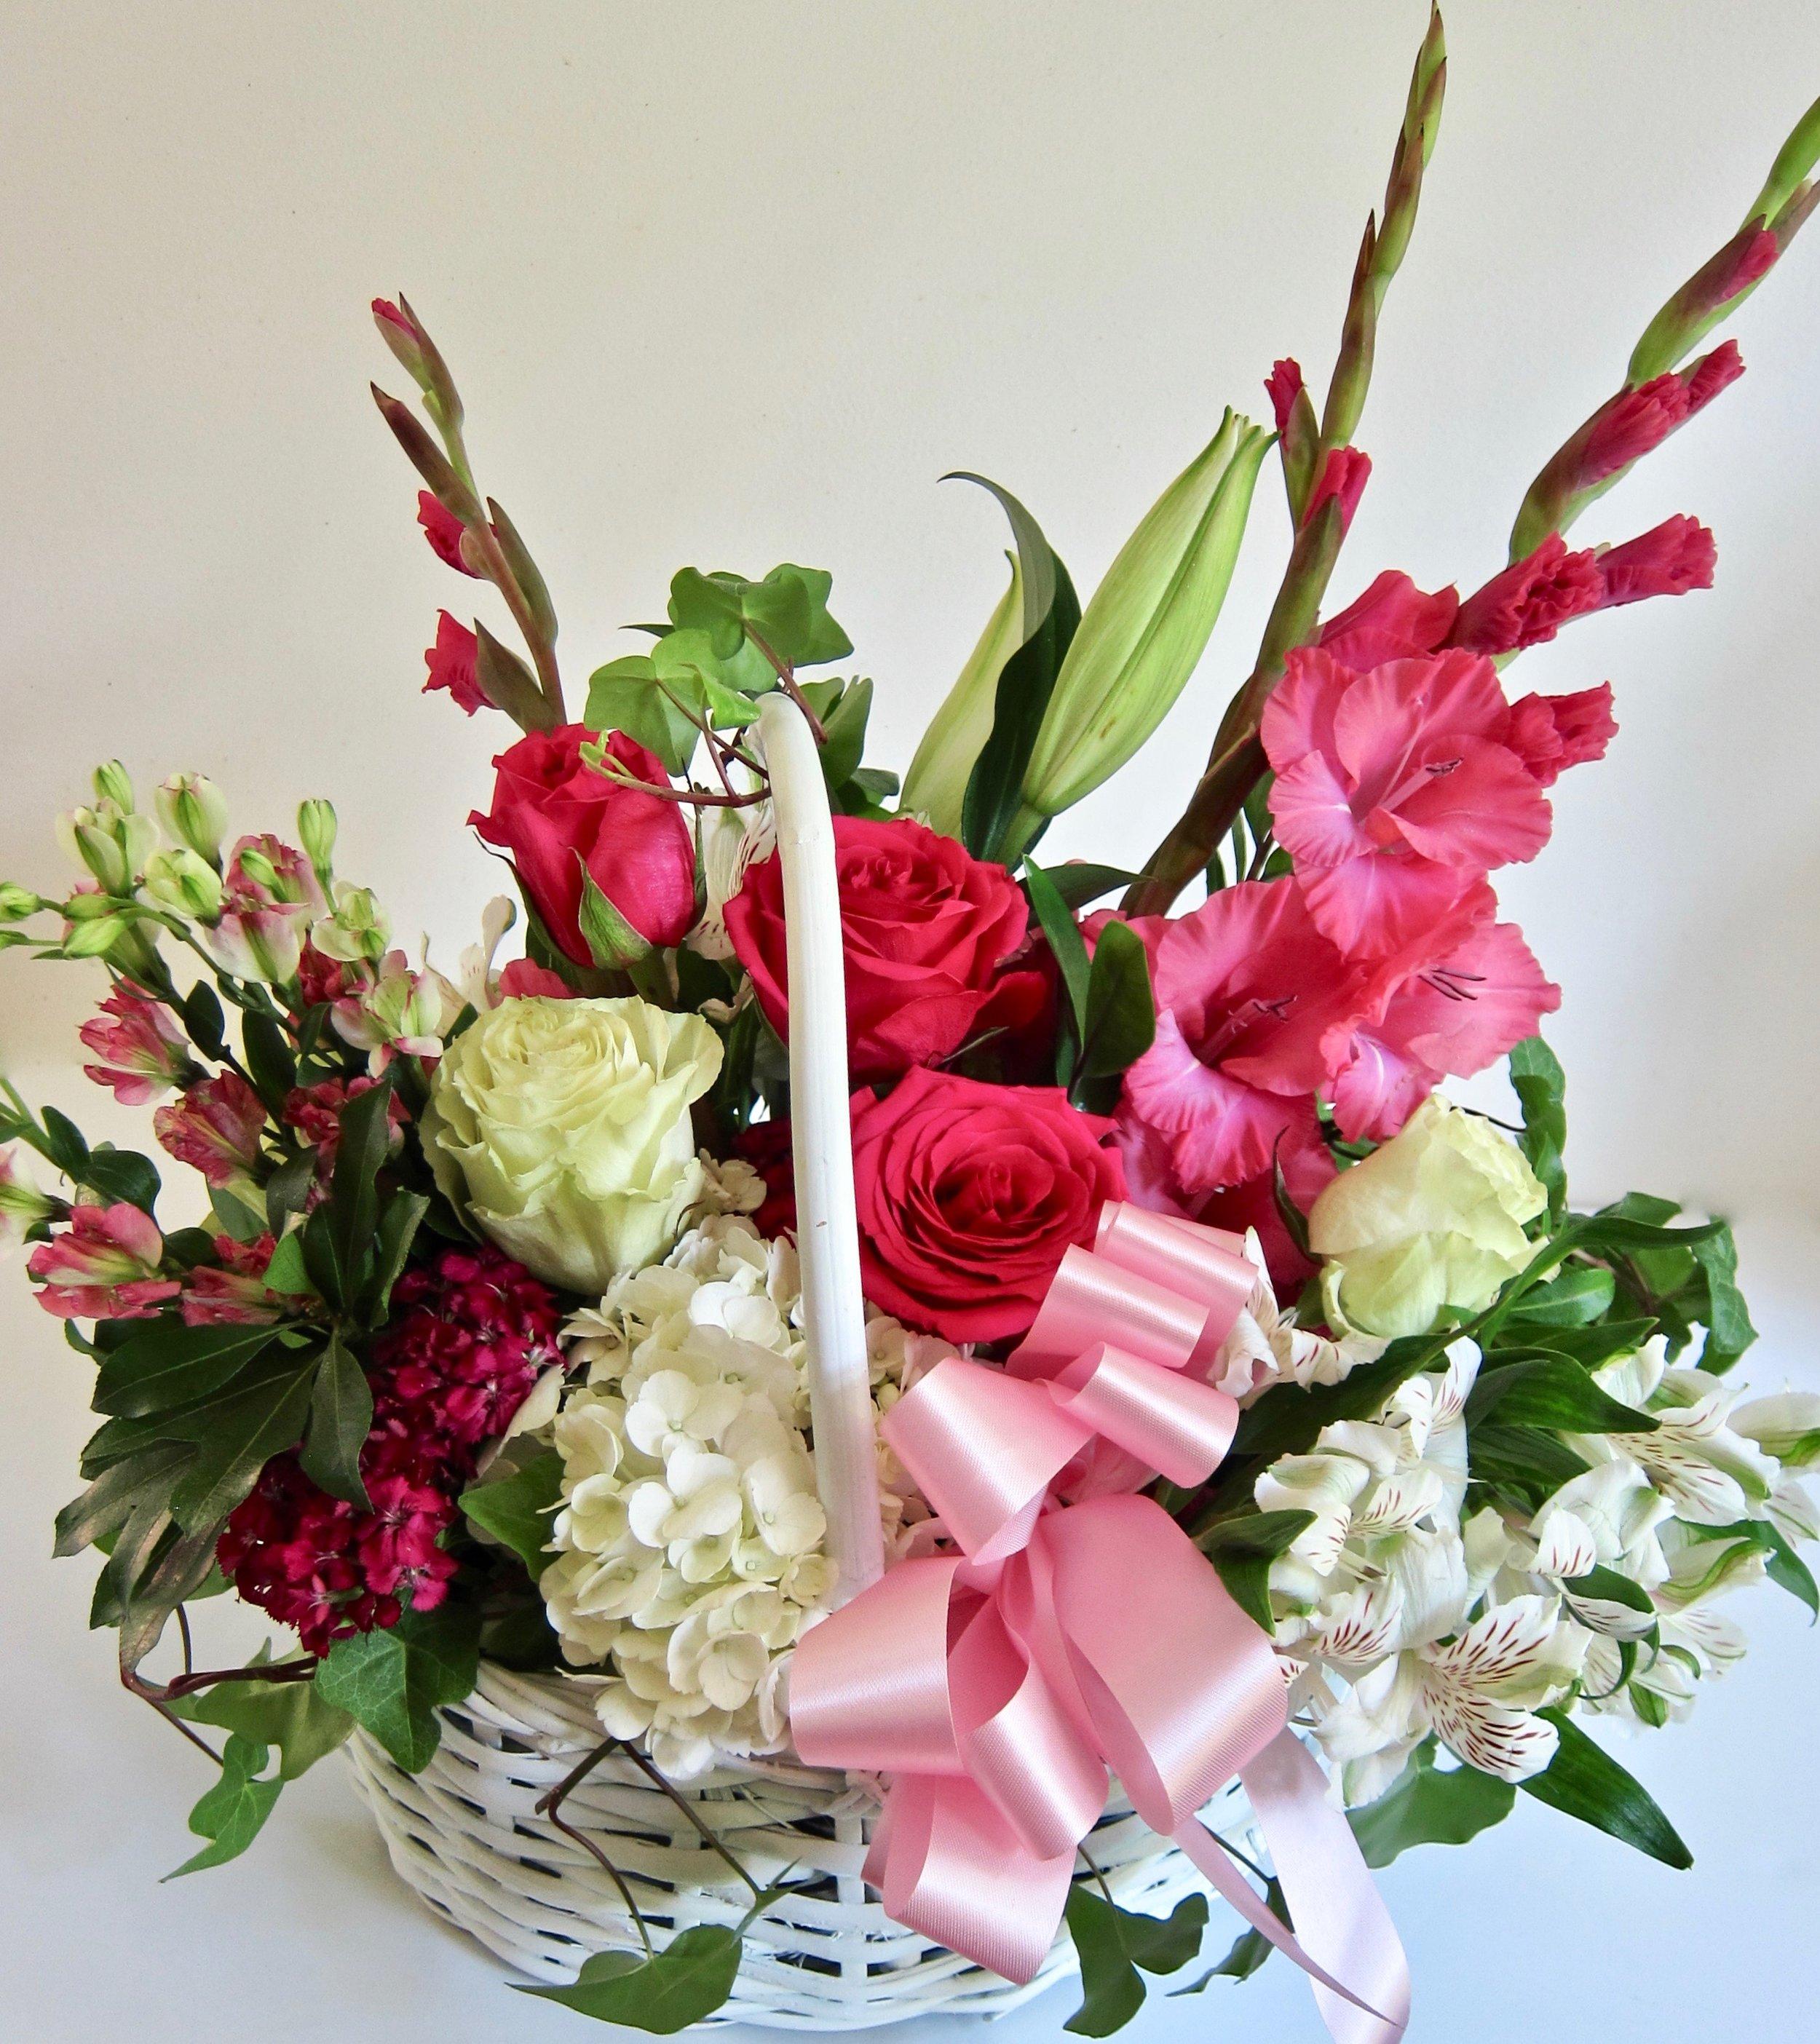 MEDIUM BASKET   Seasonal cut flowers in medium white basket, $75.